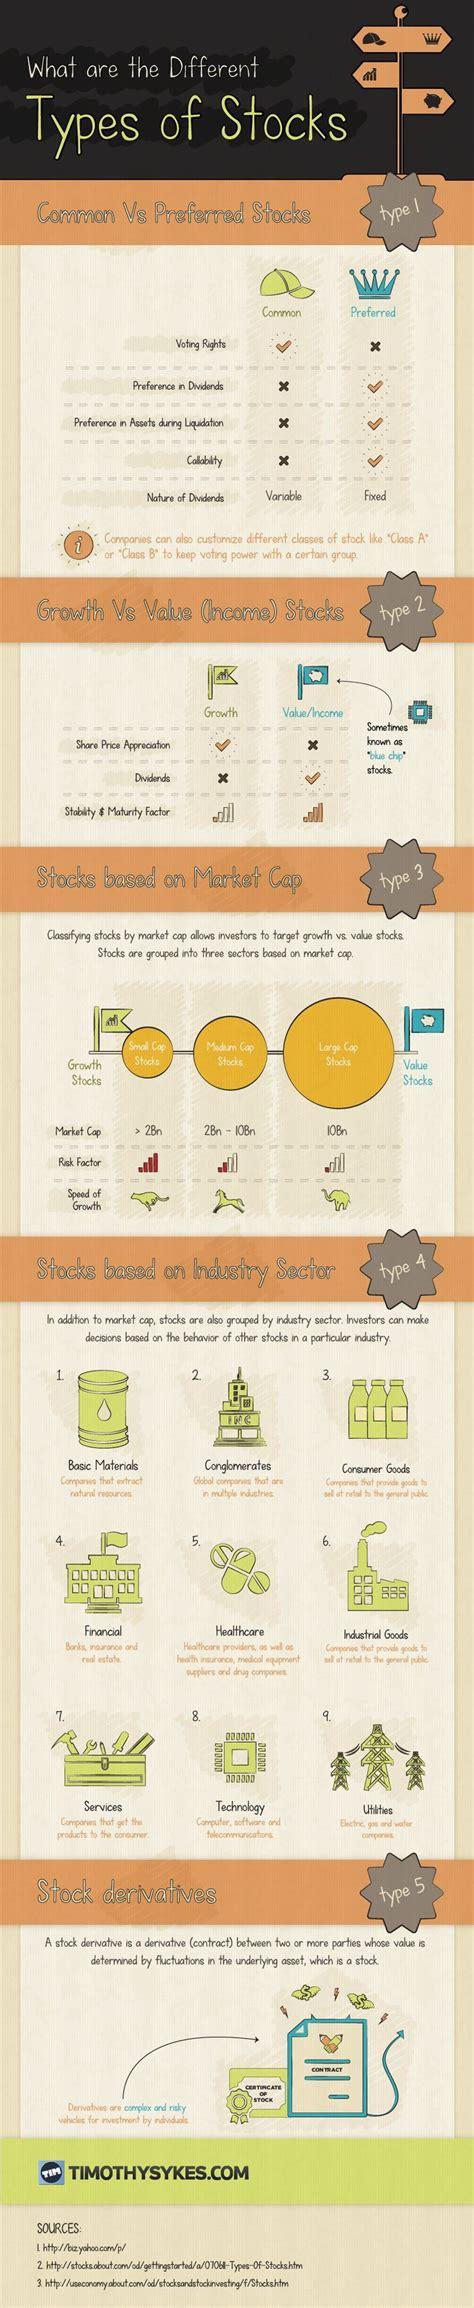 single stocks and funds venn diagram stocks vs funds venn diagram worksheet free